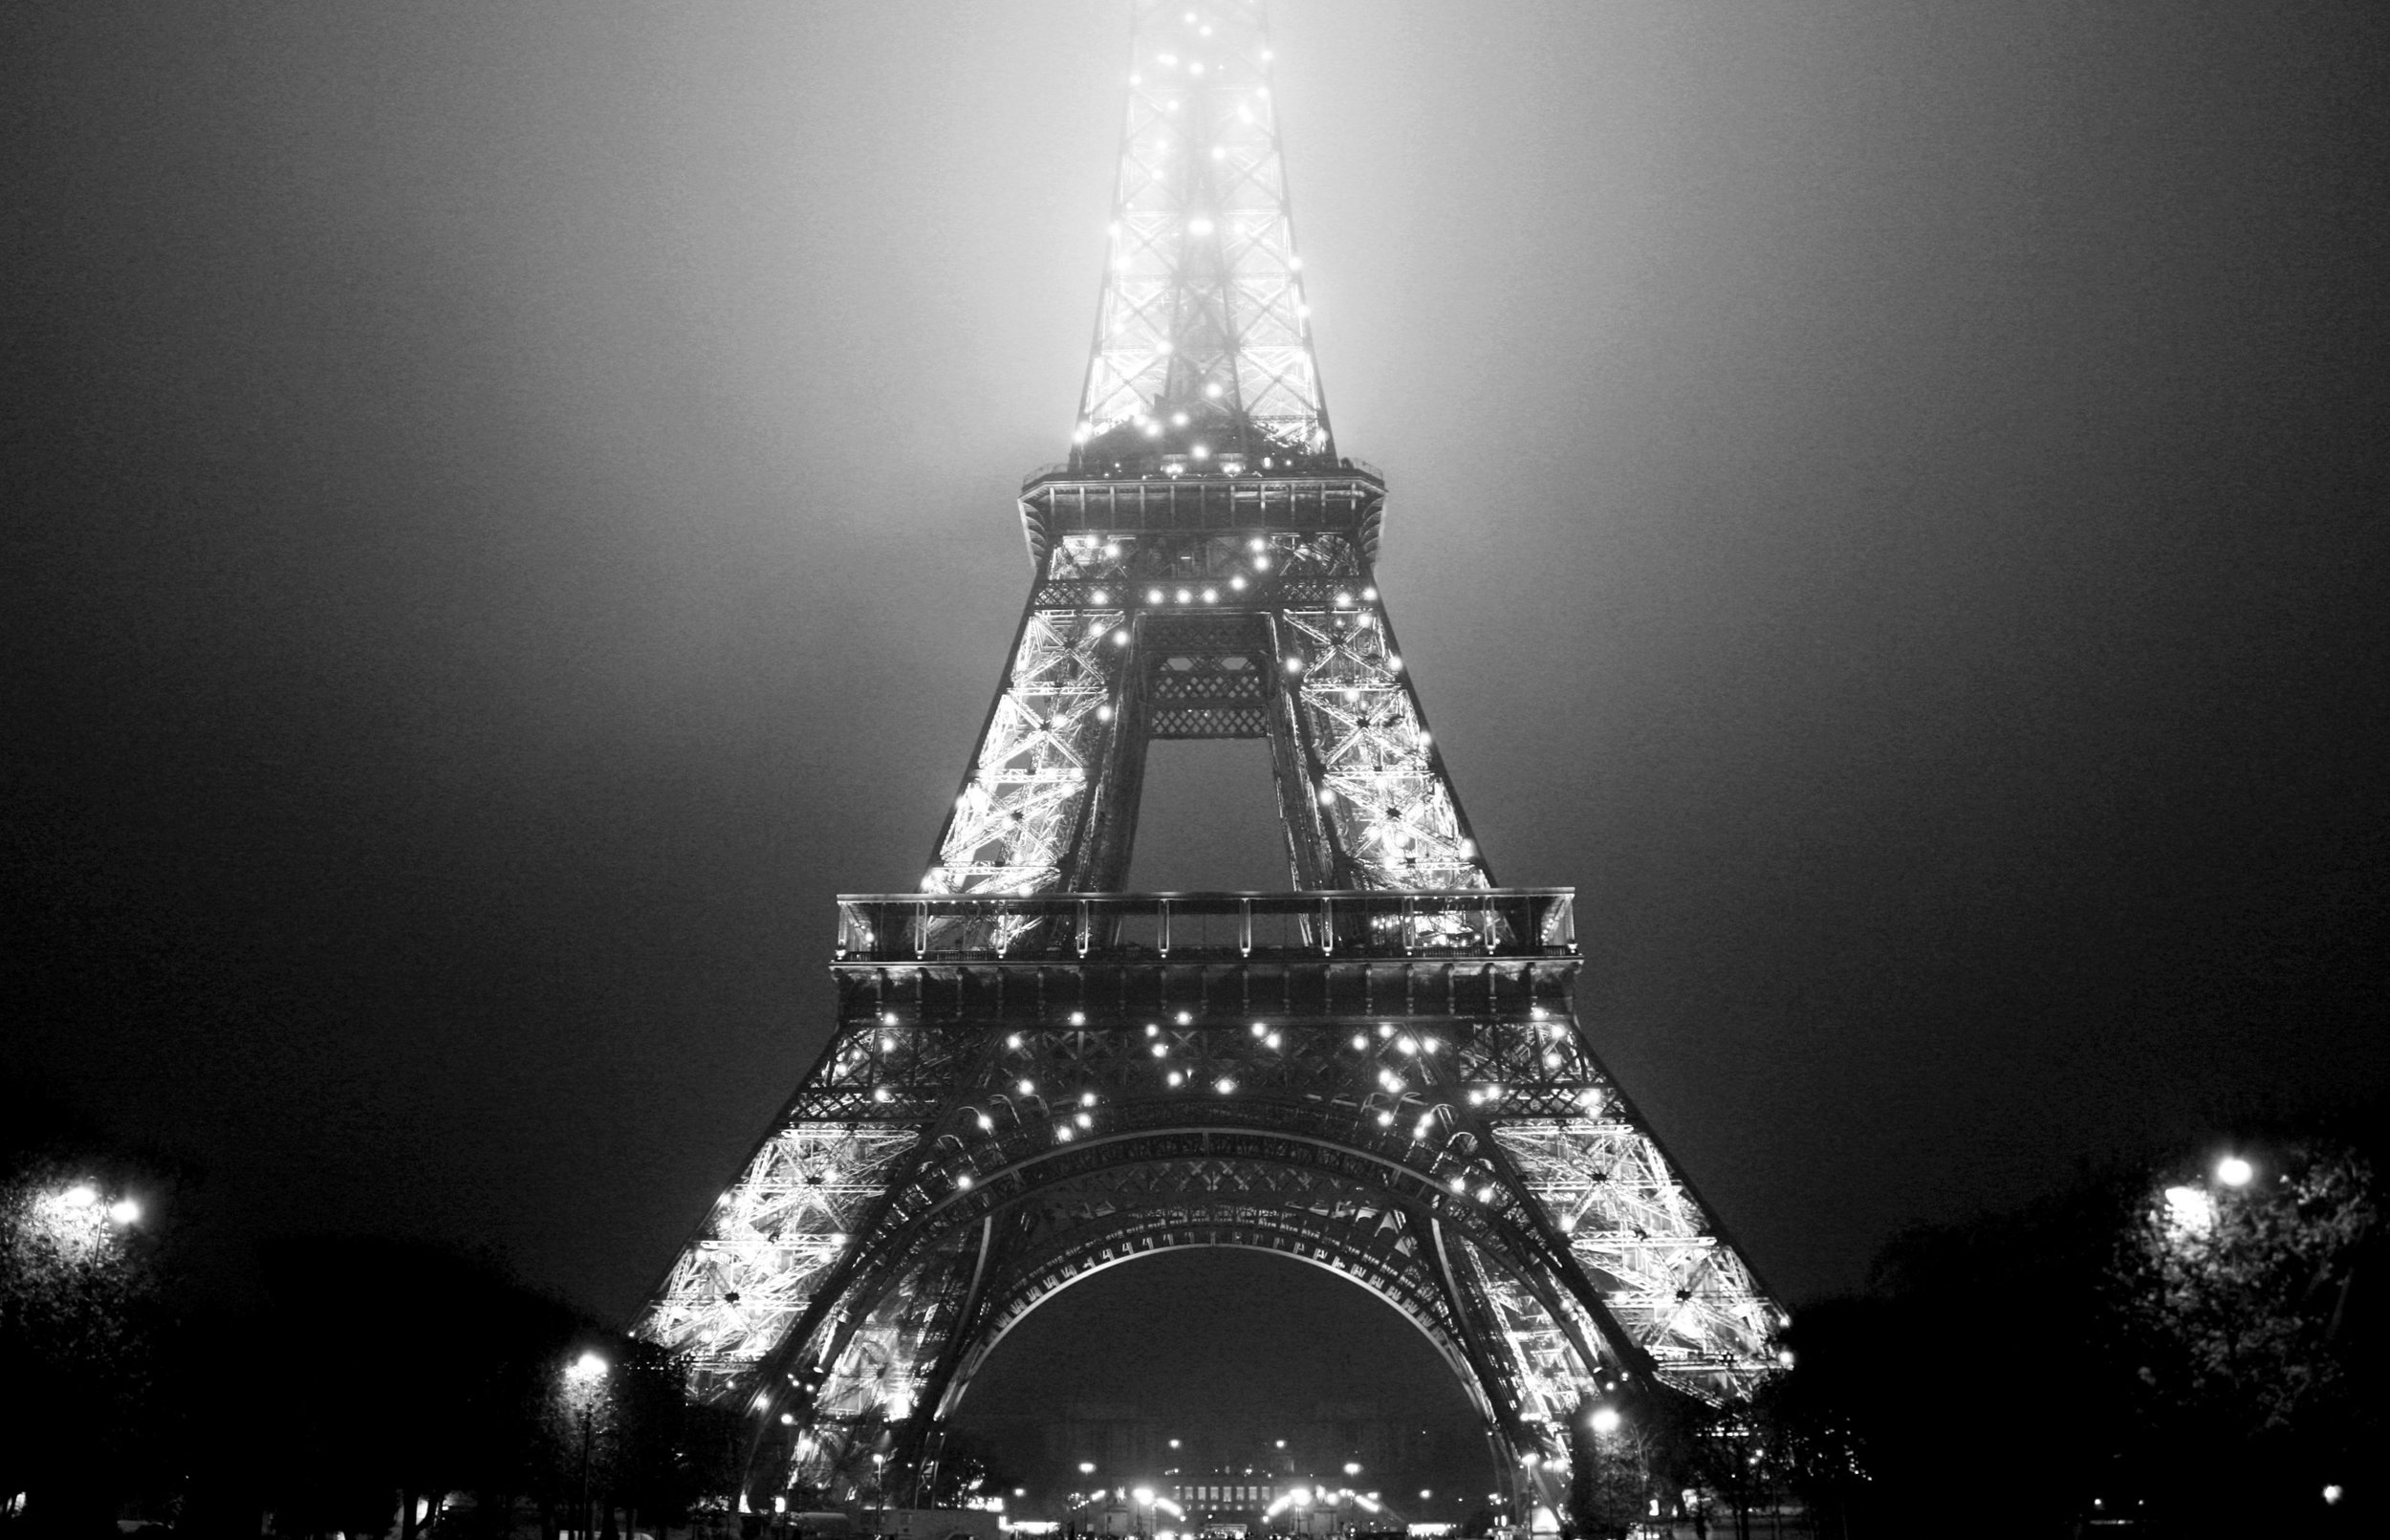 Eiffel Tower sparkling at night